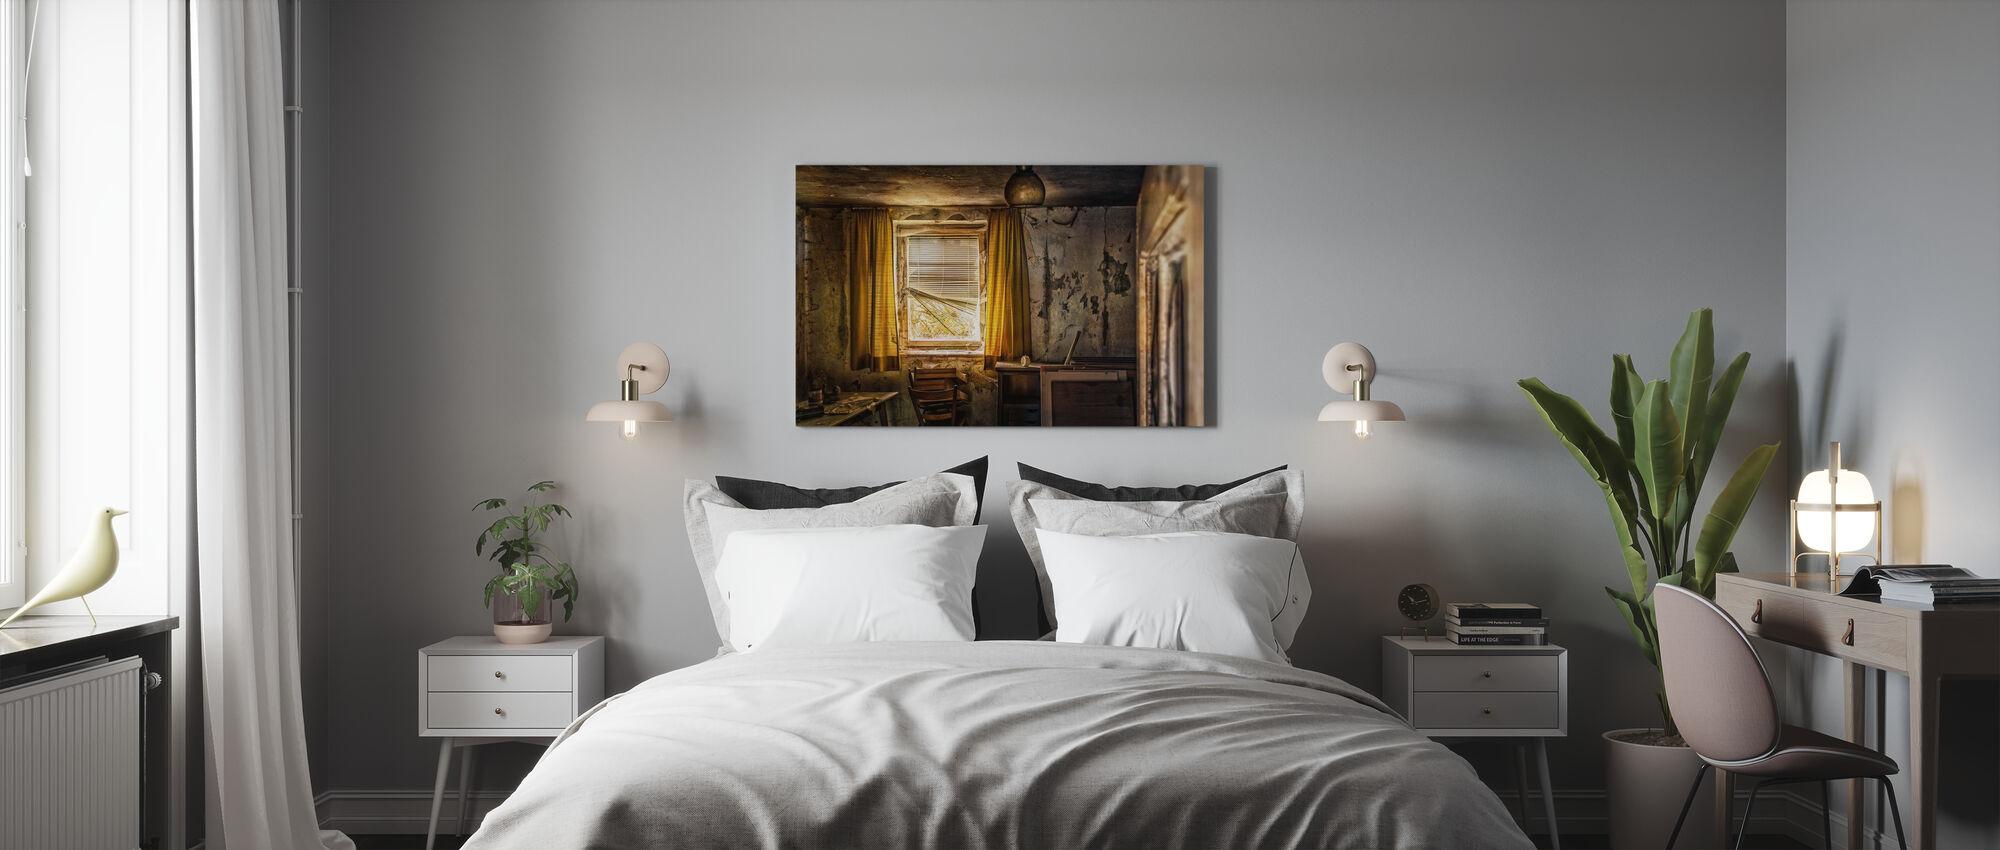 Abandoned Room - Canvas print - Bedroom